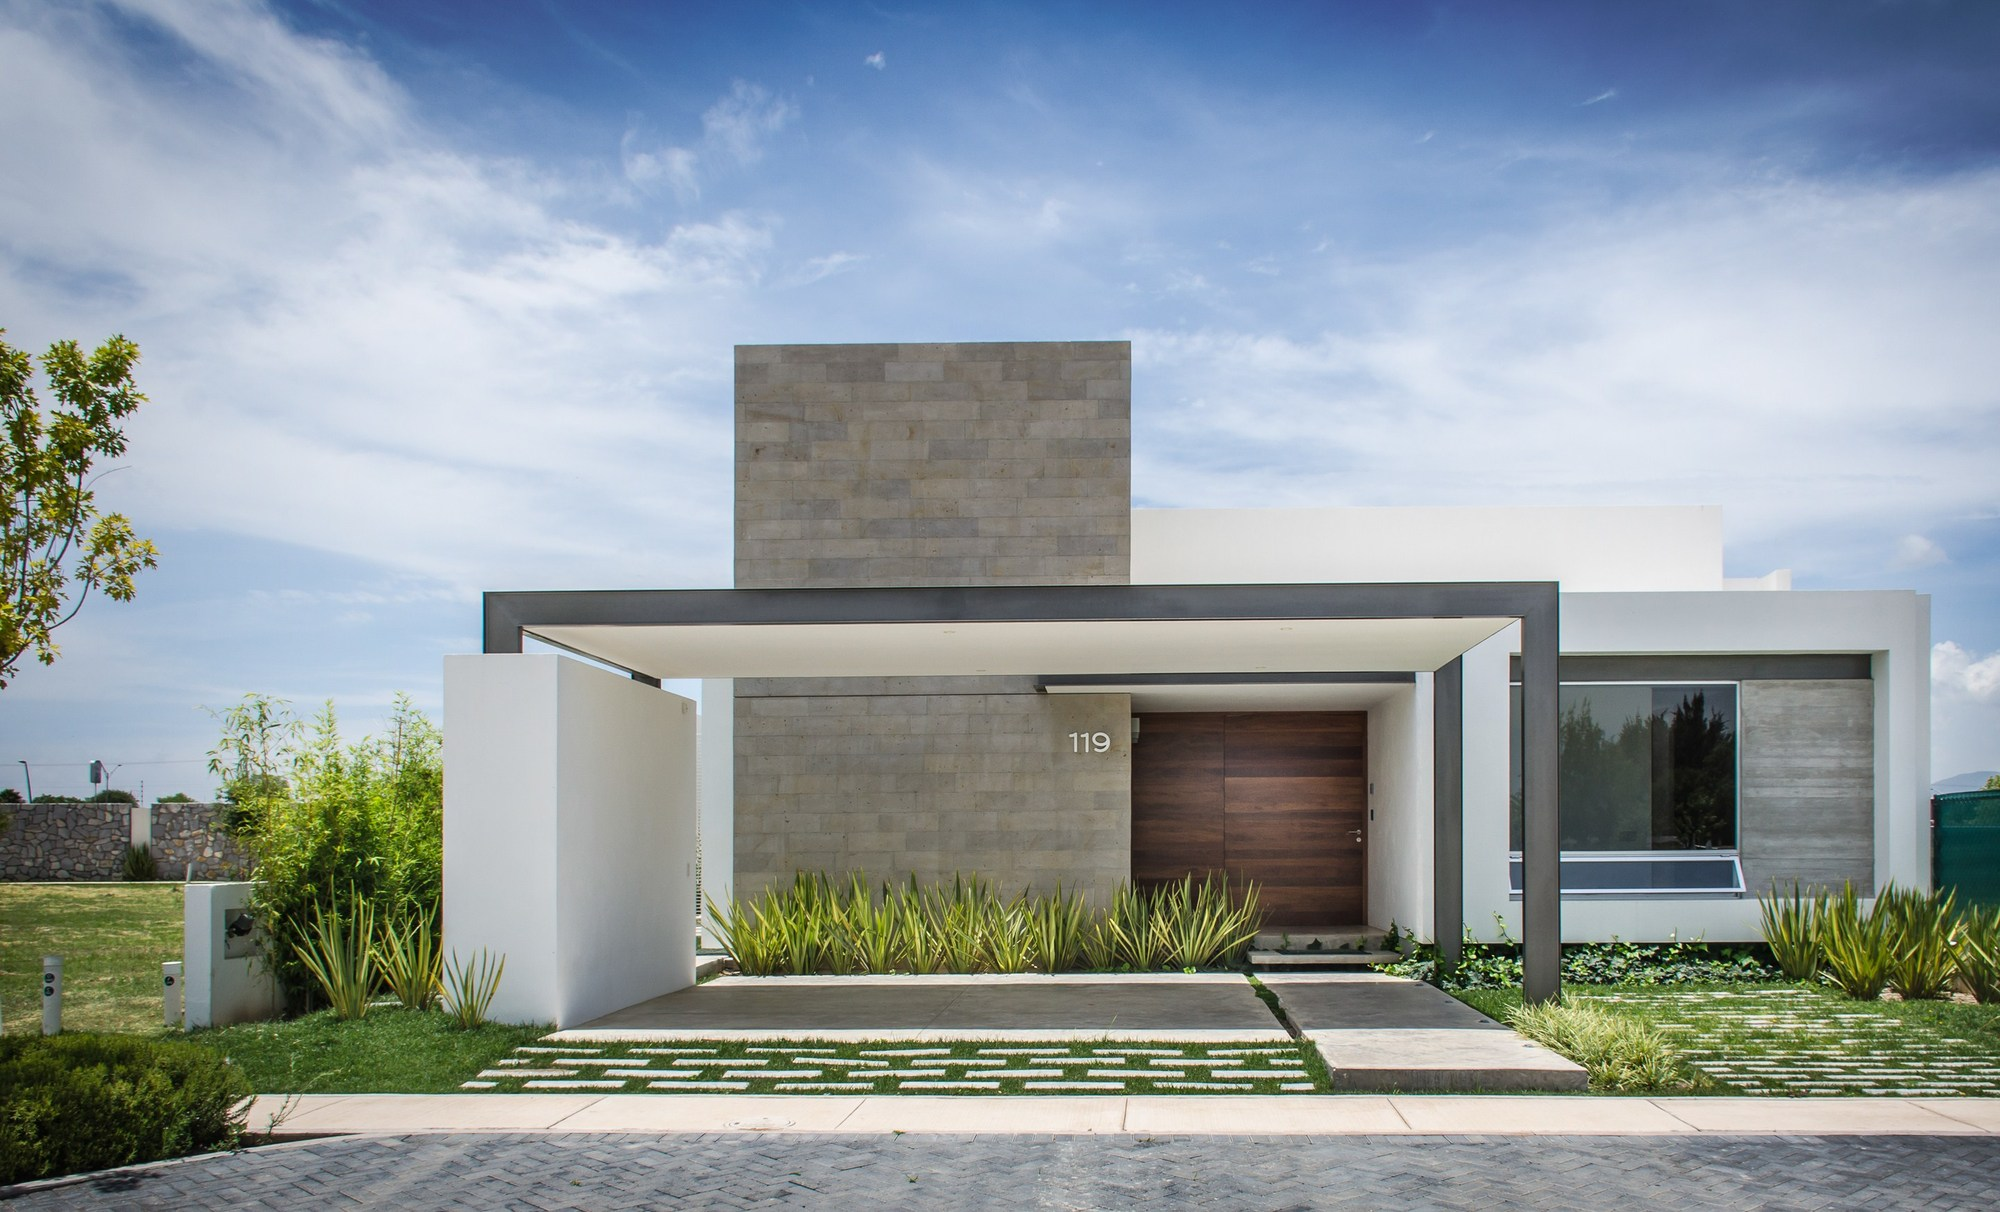 Gallery of t02 adi arquitectura y dise o interior 5 - Arquitectura y diseno ...